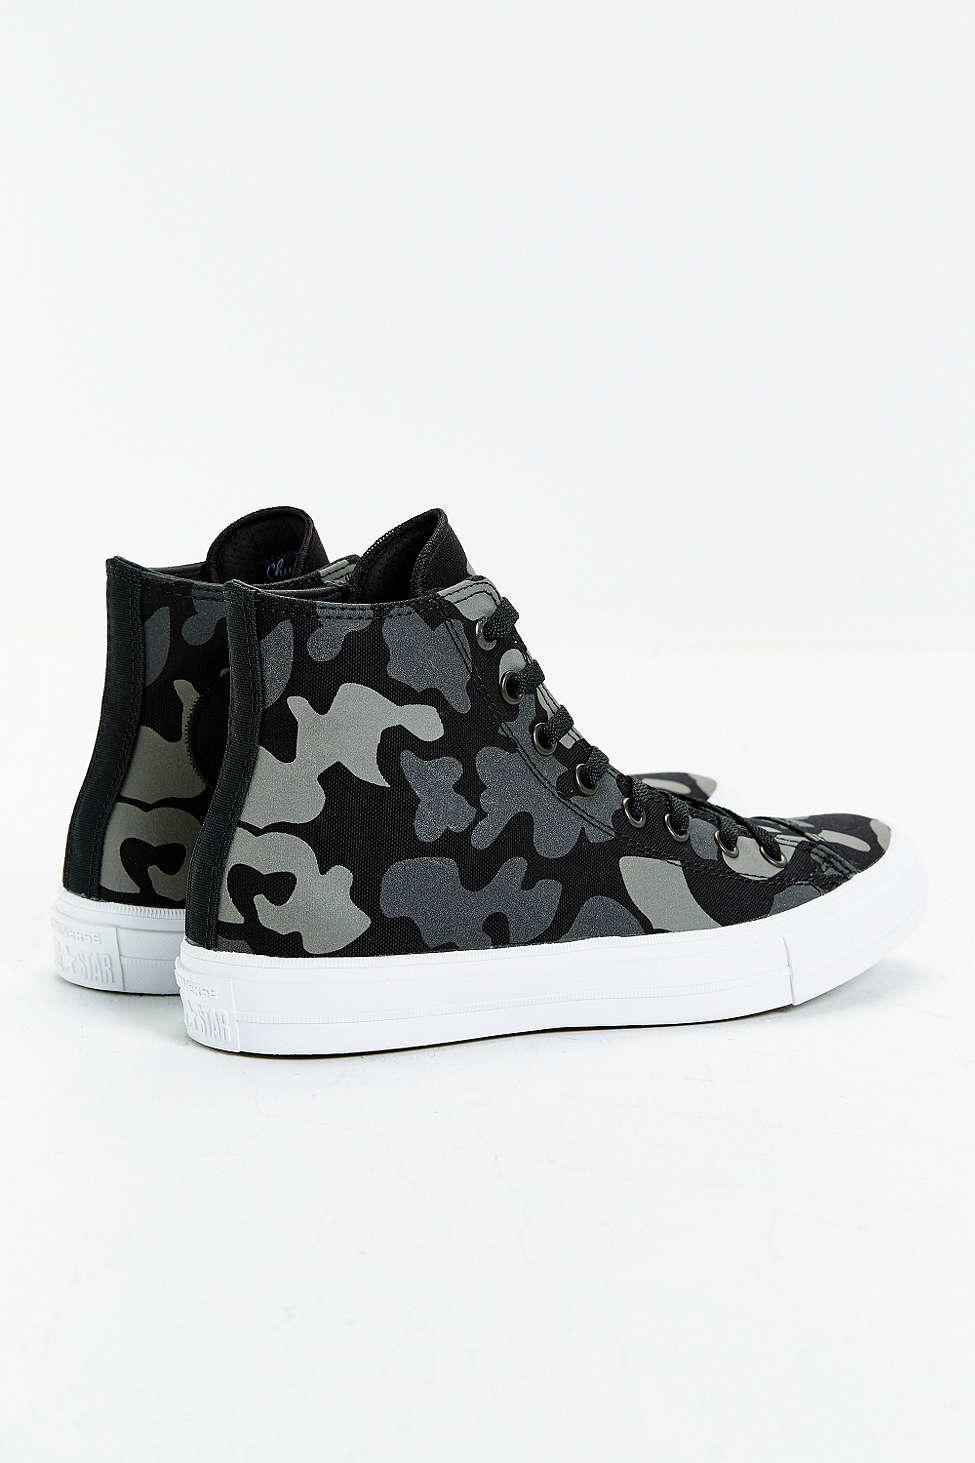 682f0d9b90e5 Lyst - Converse Chuck Taylor All Star Ii Reflective Camo Sneaker in Blue